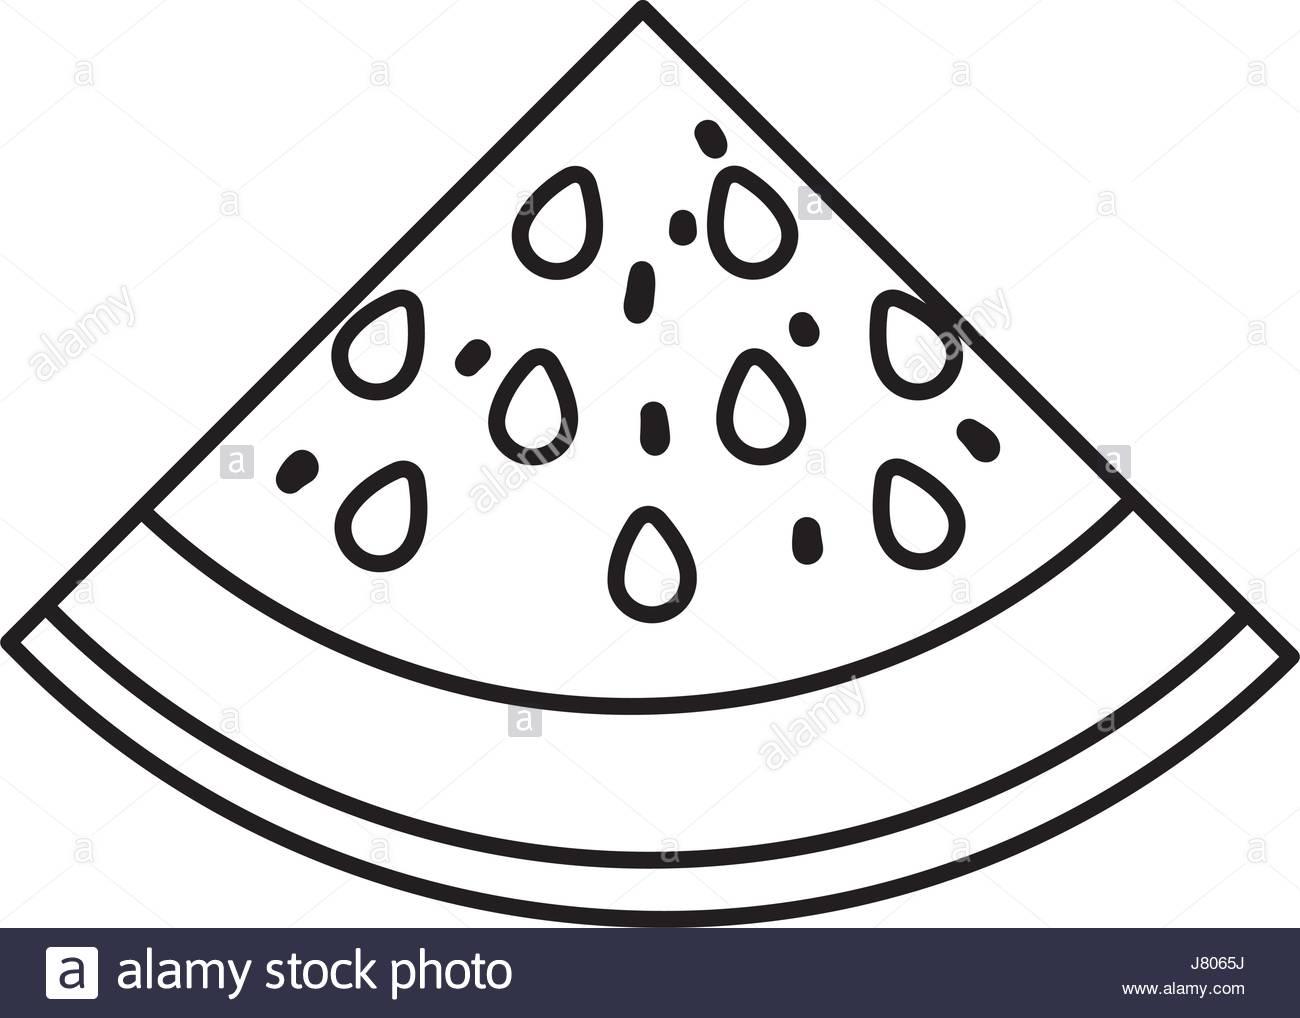 1300x1018 Black Silhouette With Watermelon Fruit Slice Stock Vector Art